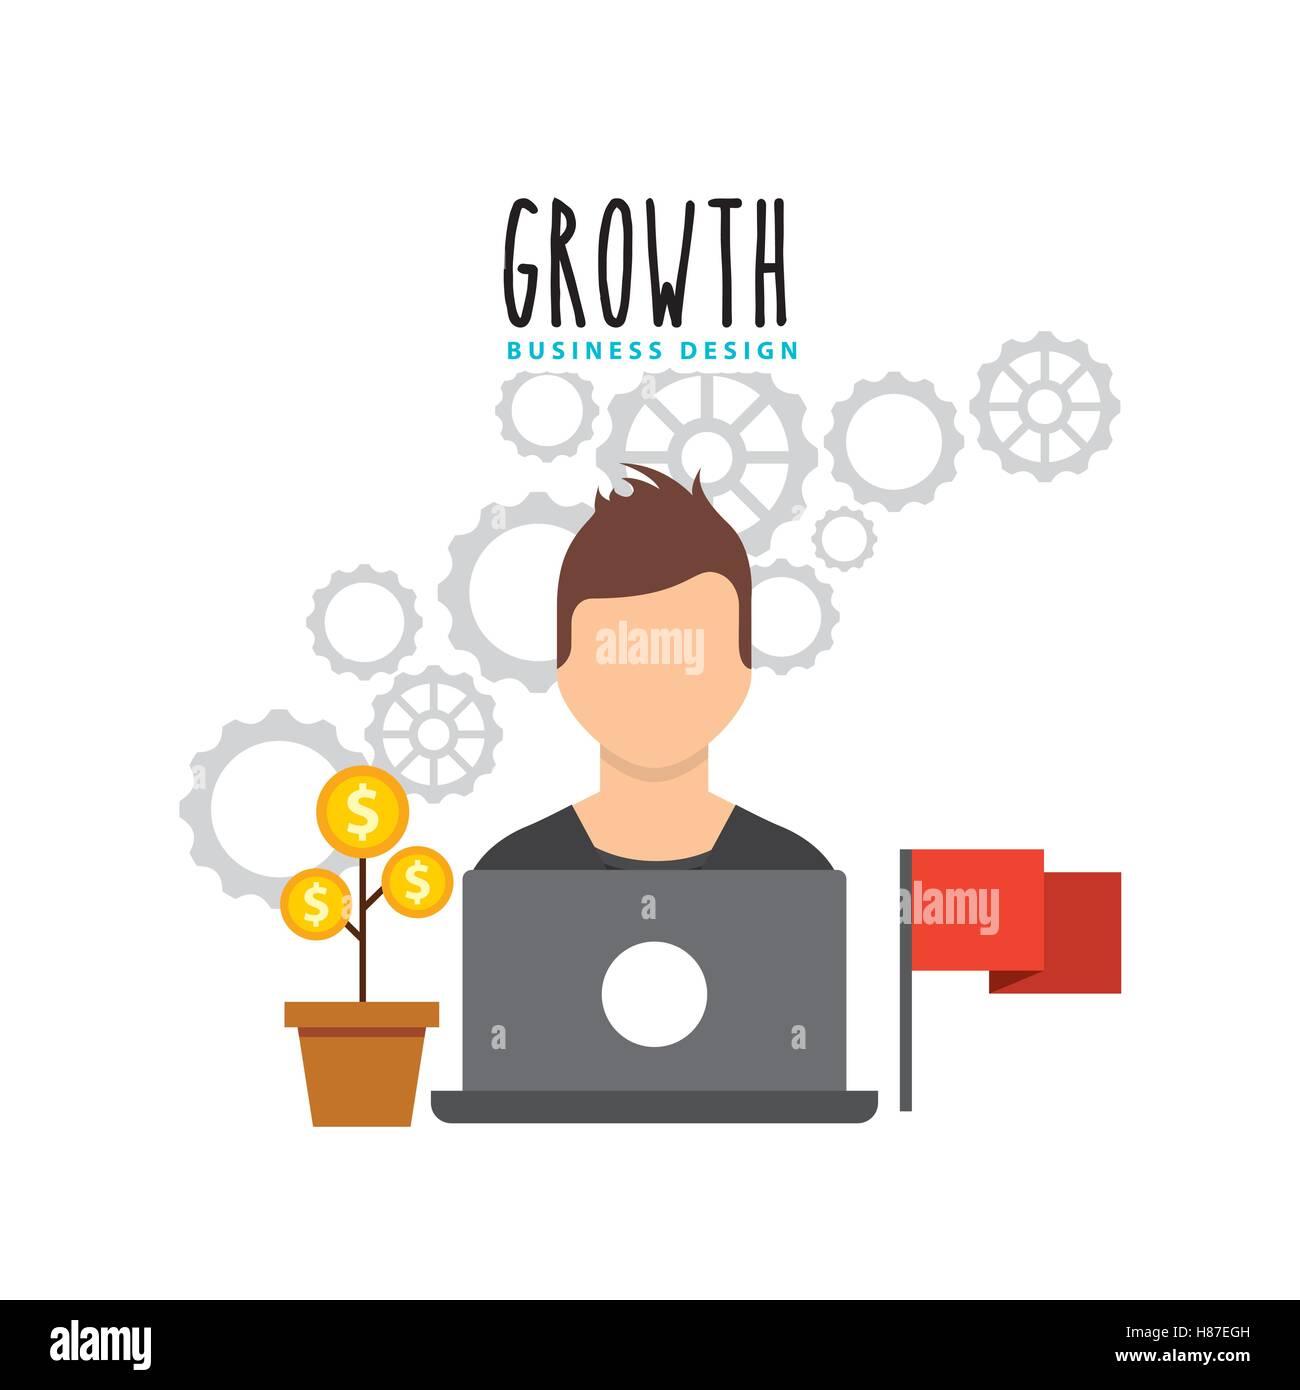 Geschäft Wachstumsfonds flache Symbole Vektor-Illustration-design Stockbild